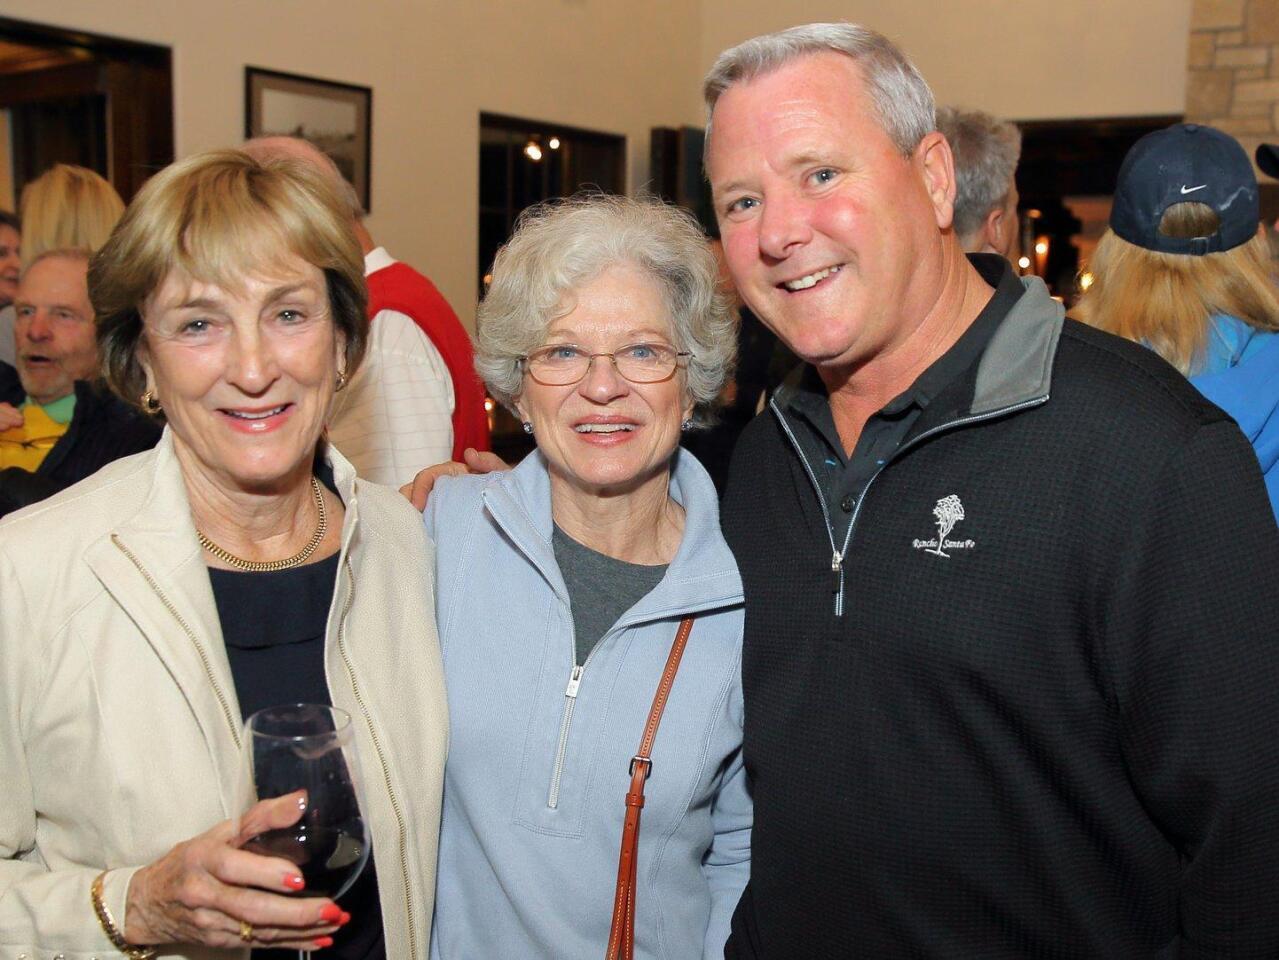 RFS Golf Club completes upgrades